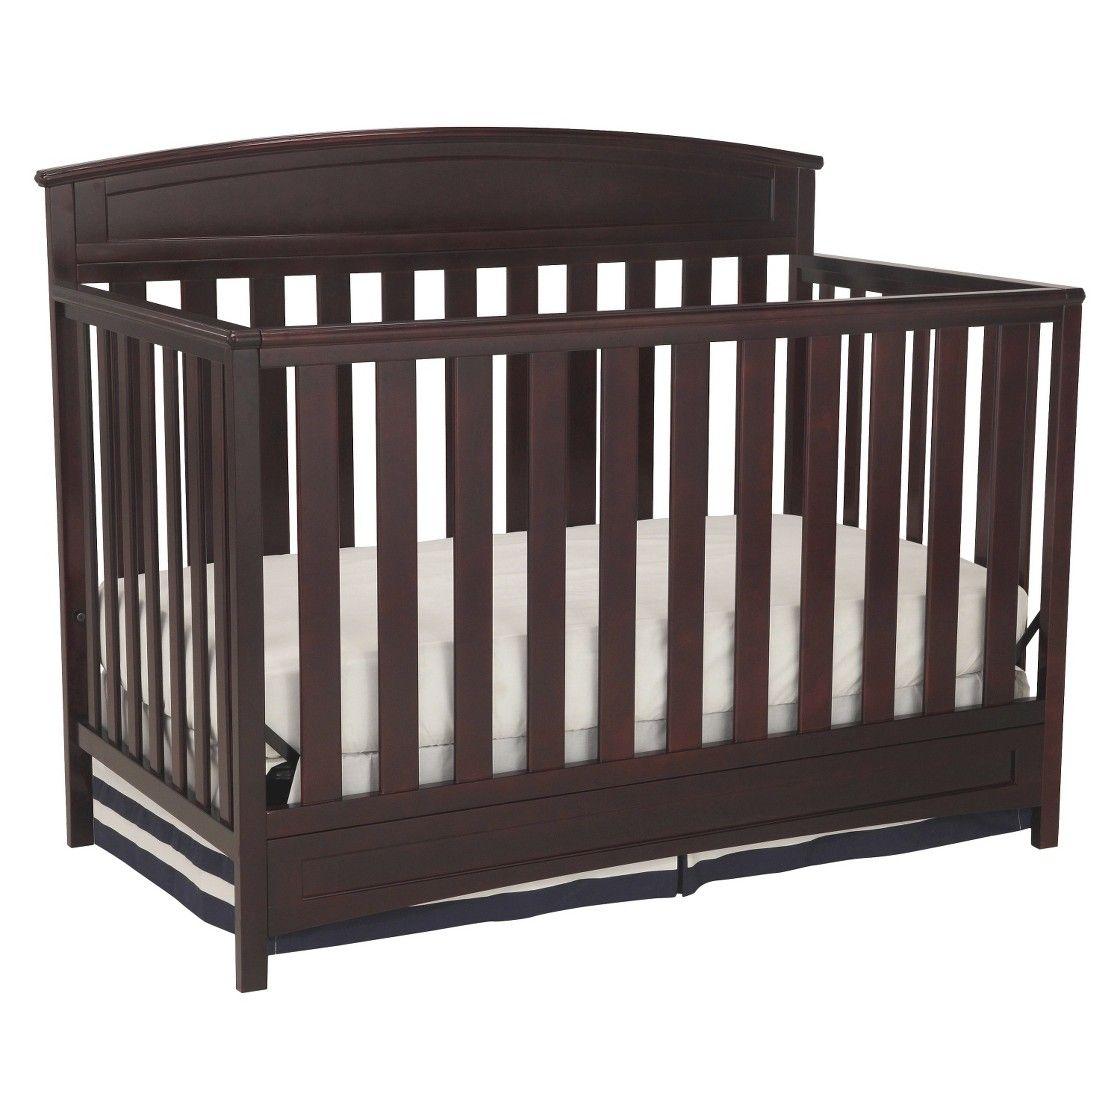 Sutton 4 In 1 Convertible Crib Cribs Delta Children Convertible Crib